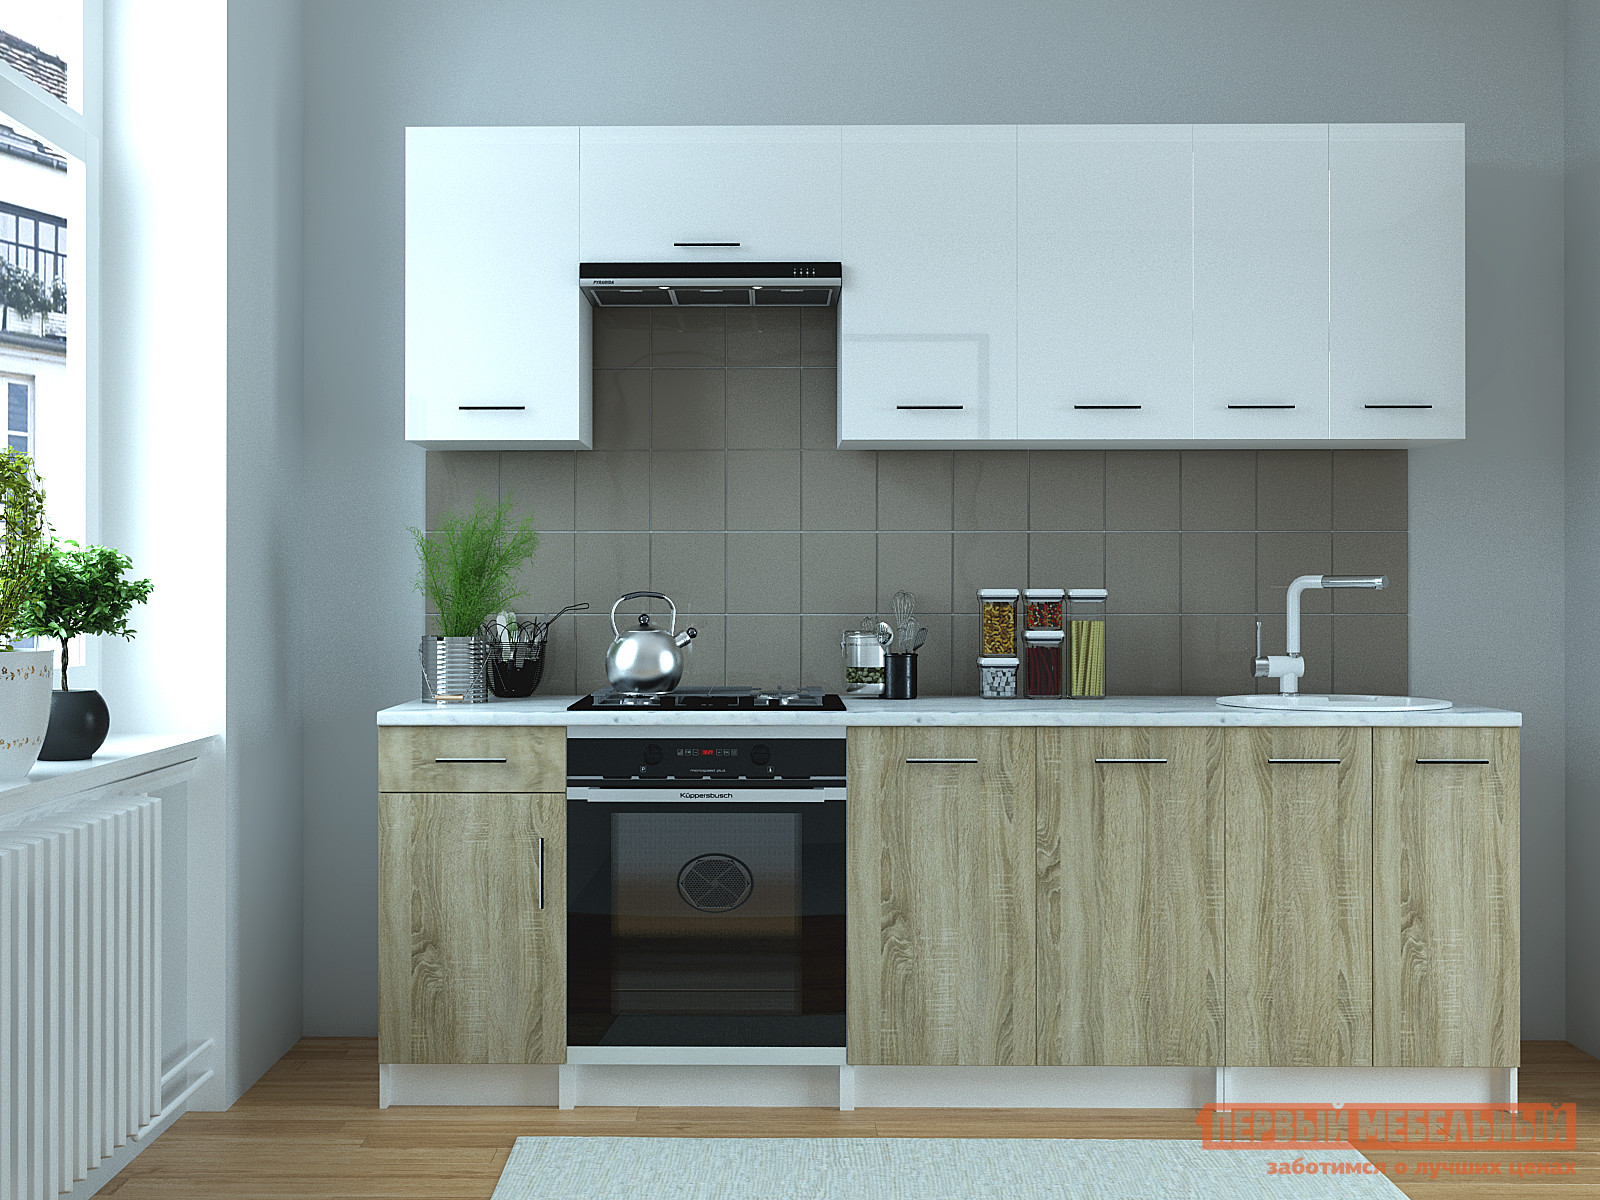 Кухонный гарнитур НК-Мебель Арамина 240 см спальный гарнитур нк мебель марика к1